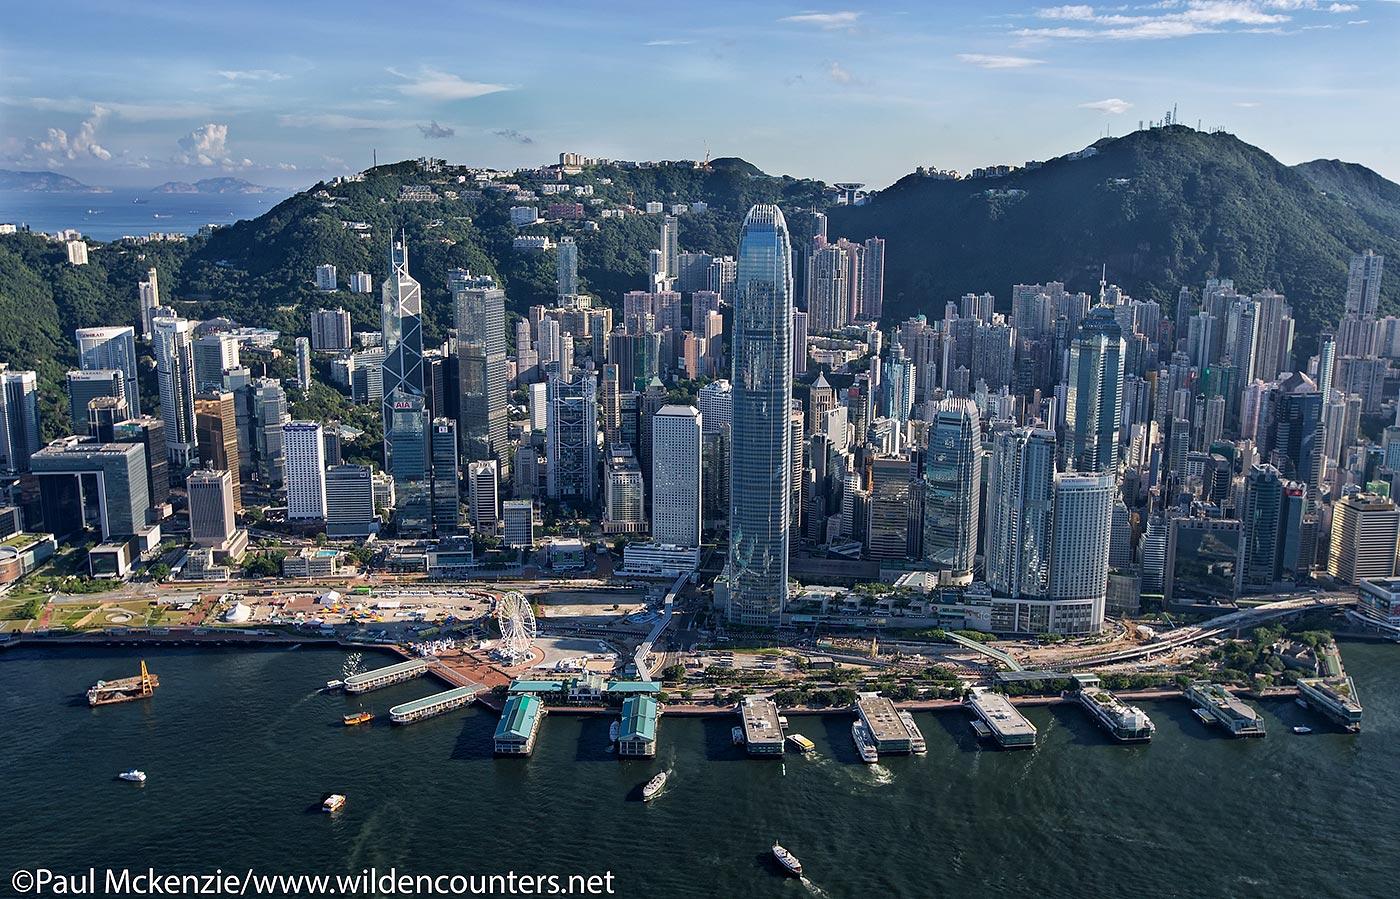 Hong Kong Wildencounters